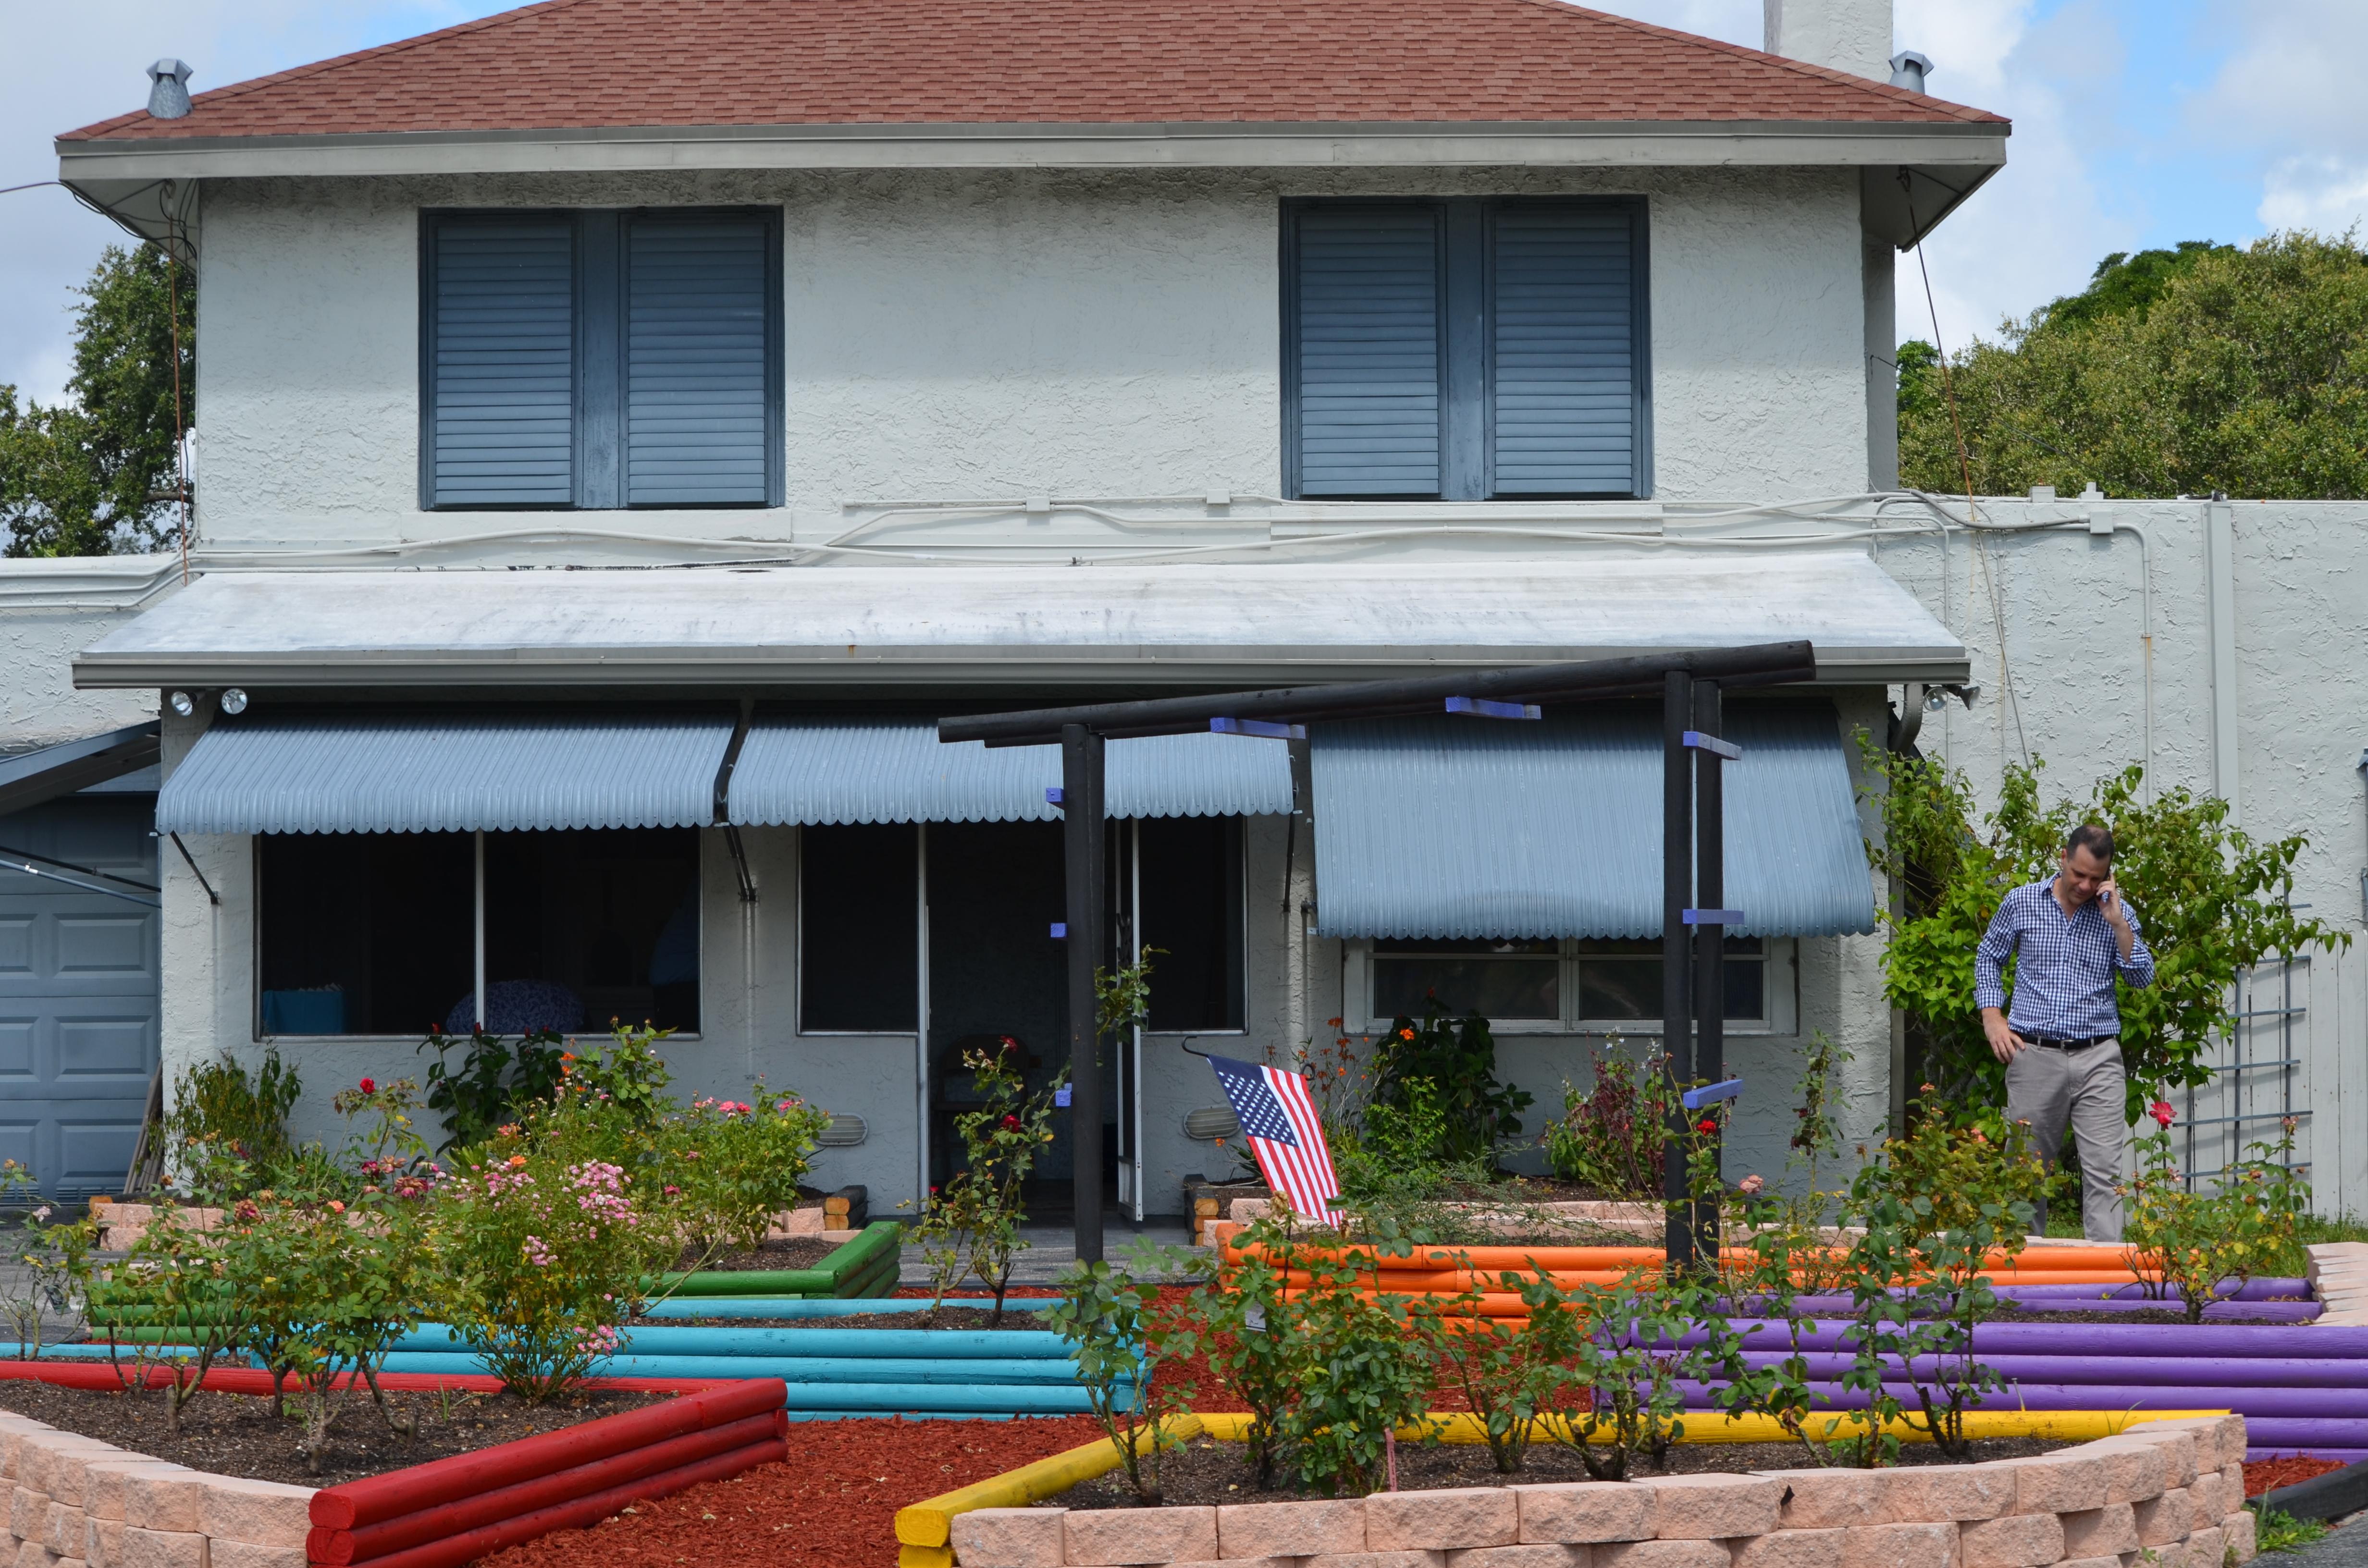 City of Miami Gardens Historic Enrico Dairy Farmhouse Hosts